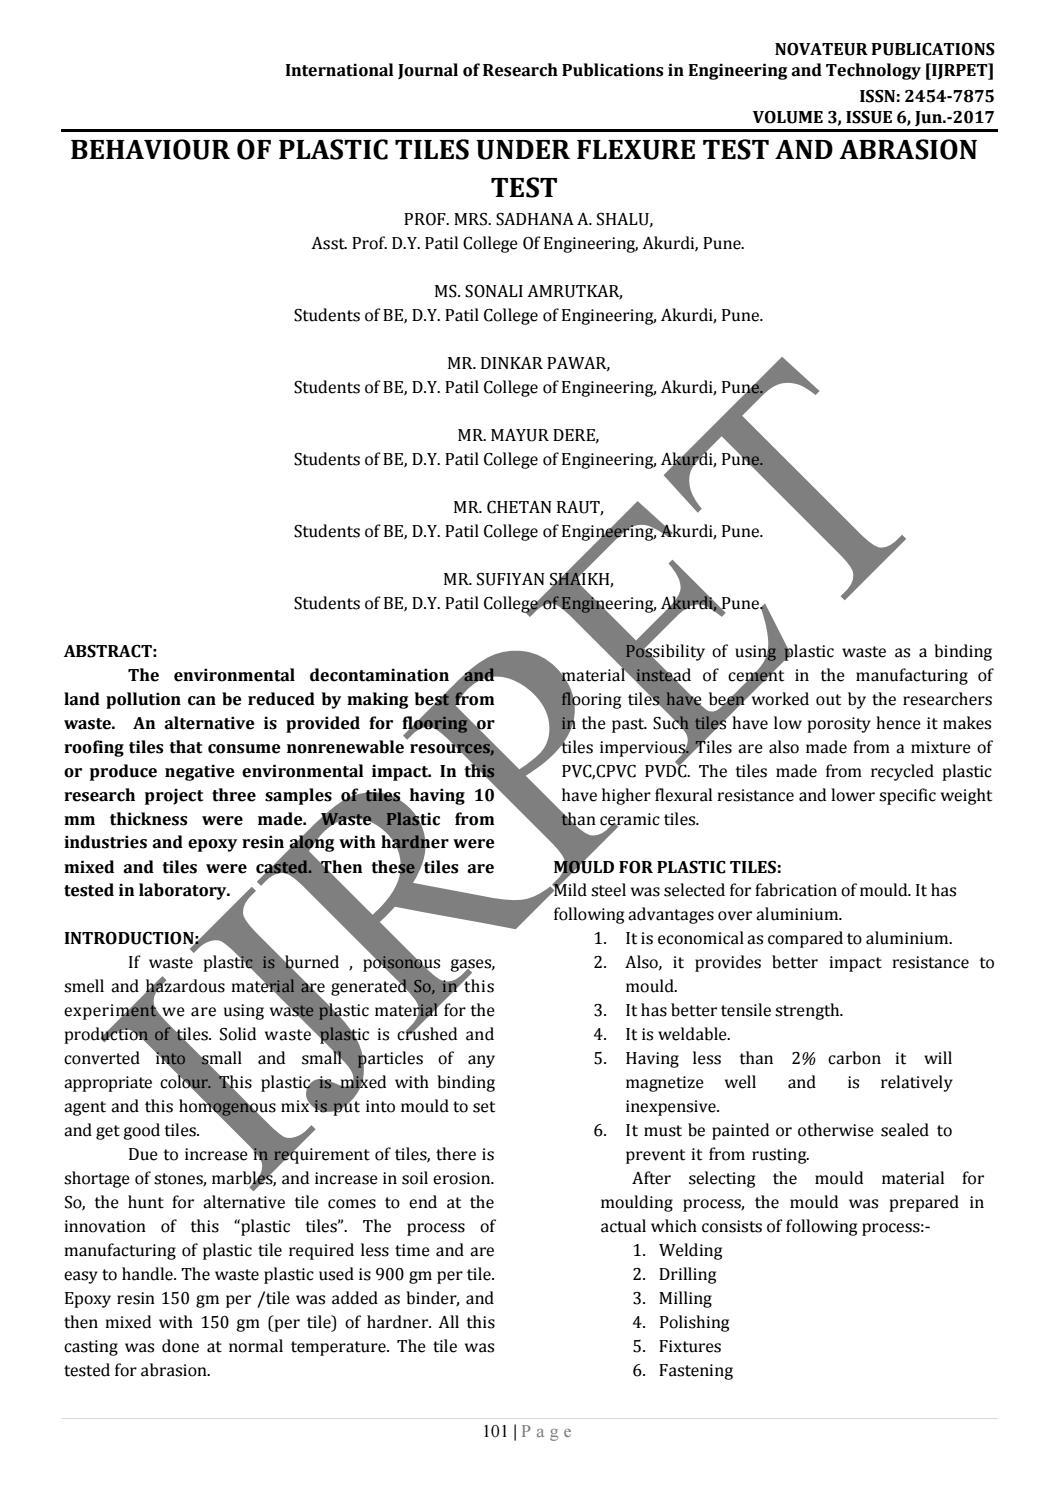 JournalNX-BEHAVIOR OF PLASTIC TILES UNDER FLEXURE TEST AND ABRASION